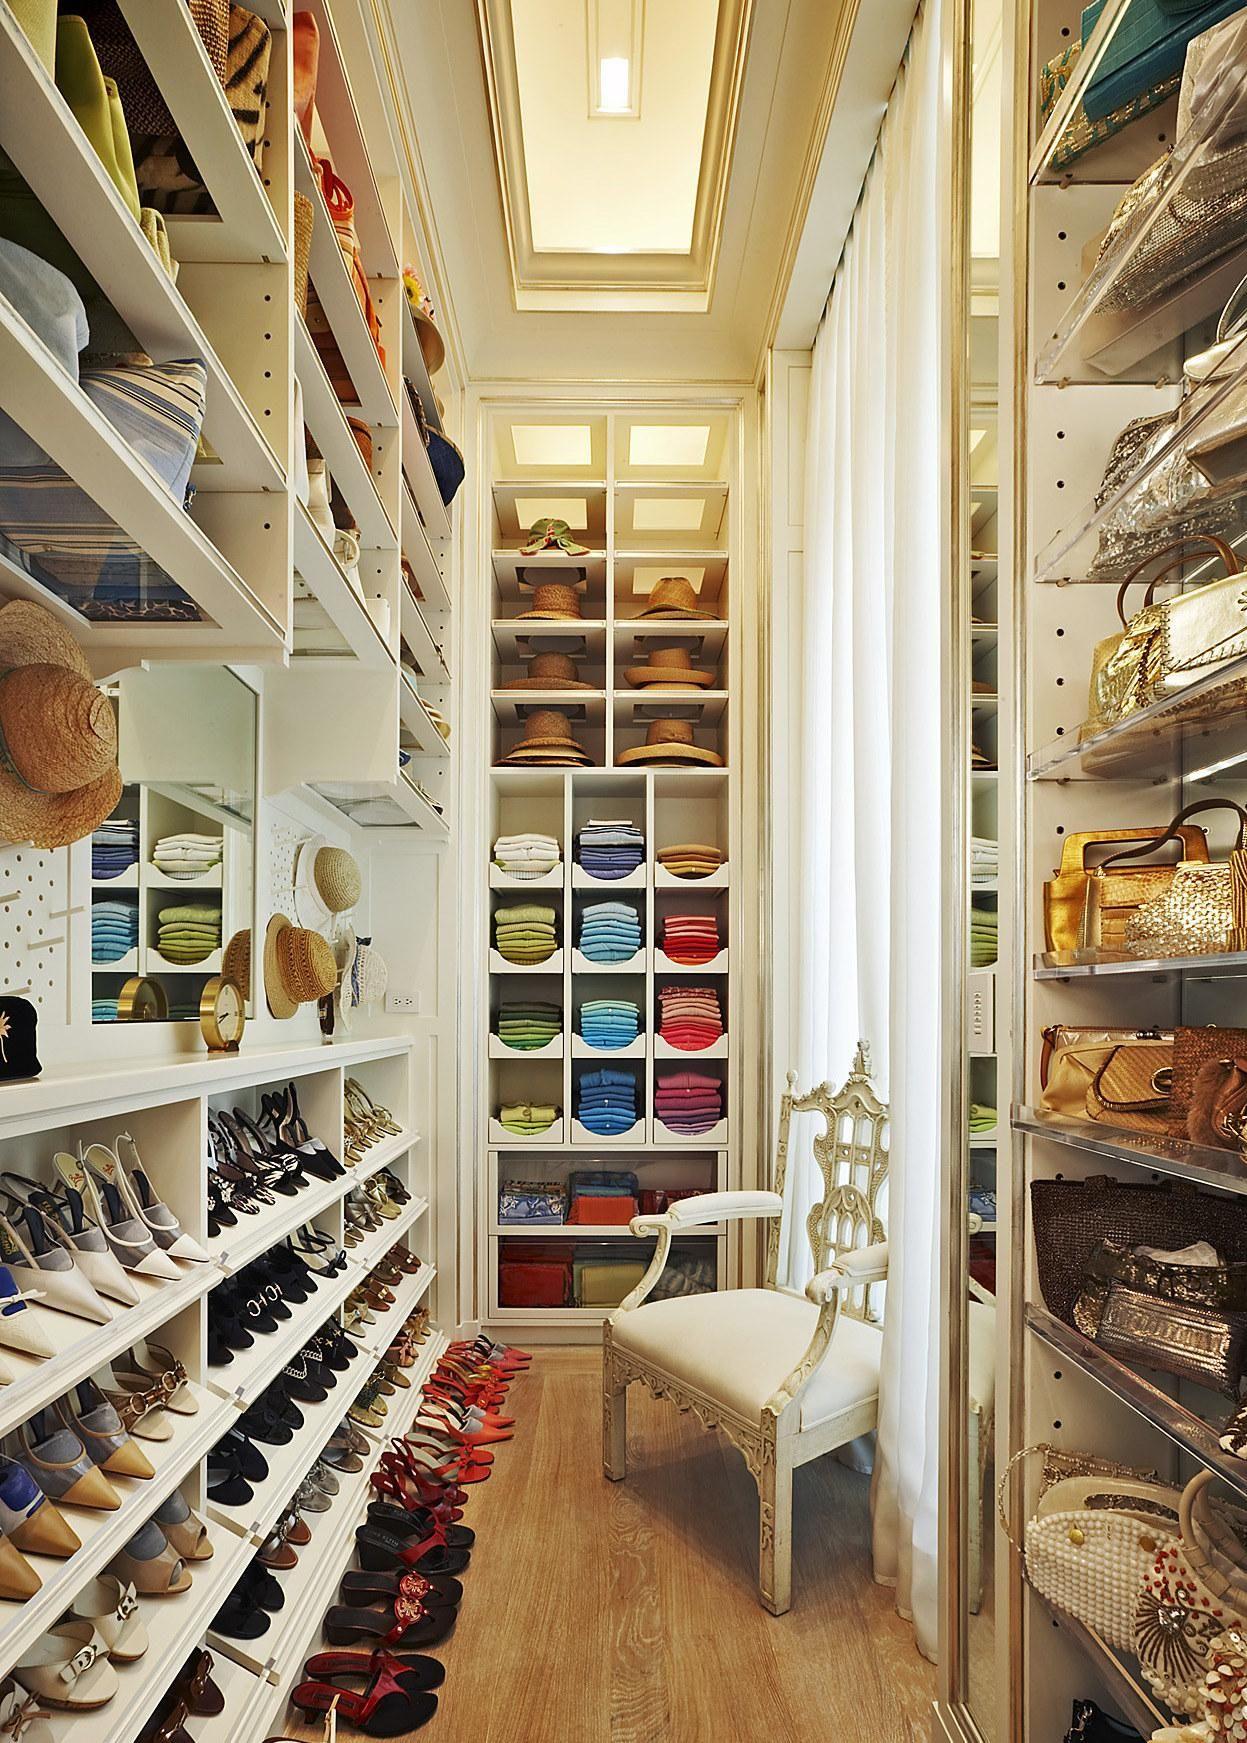 29 Best Closet Organization Ideas To Maximize Space And Style Walk In Closet Design Luxurious Walk In Closet Dream Closets